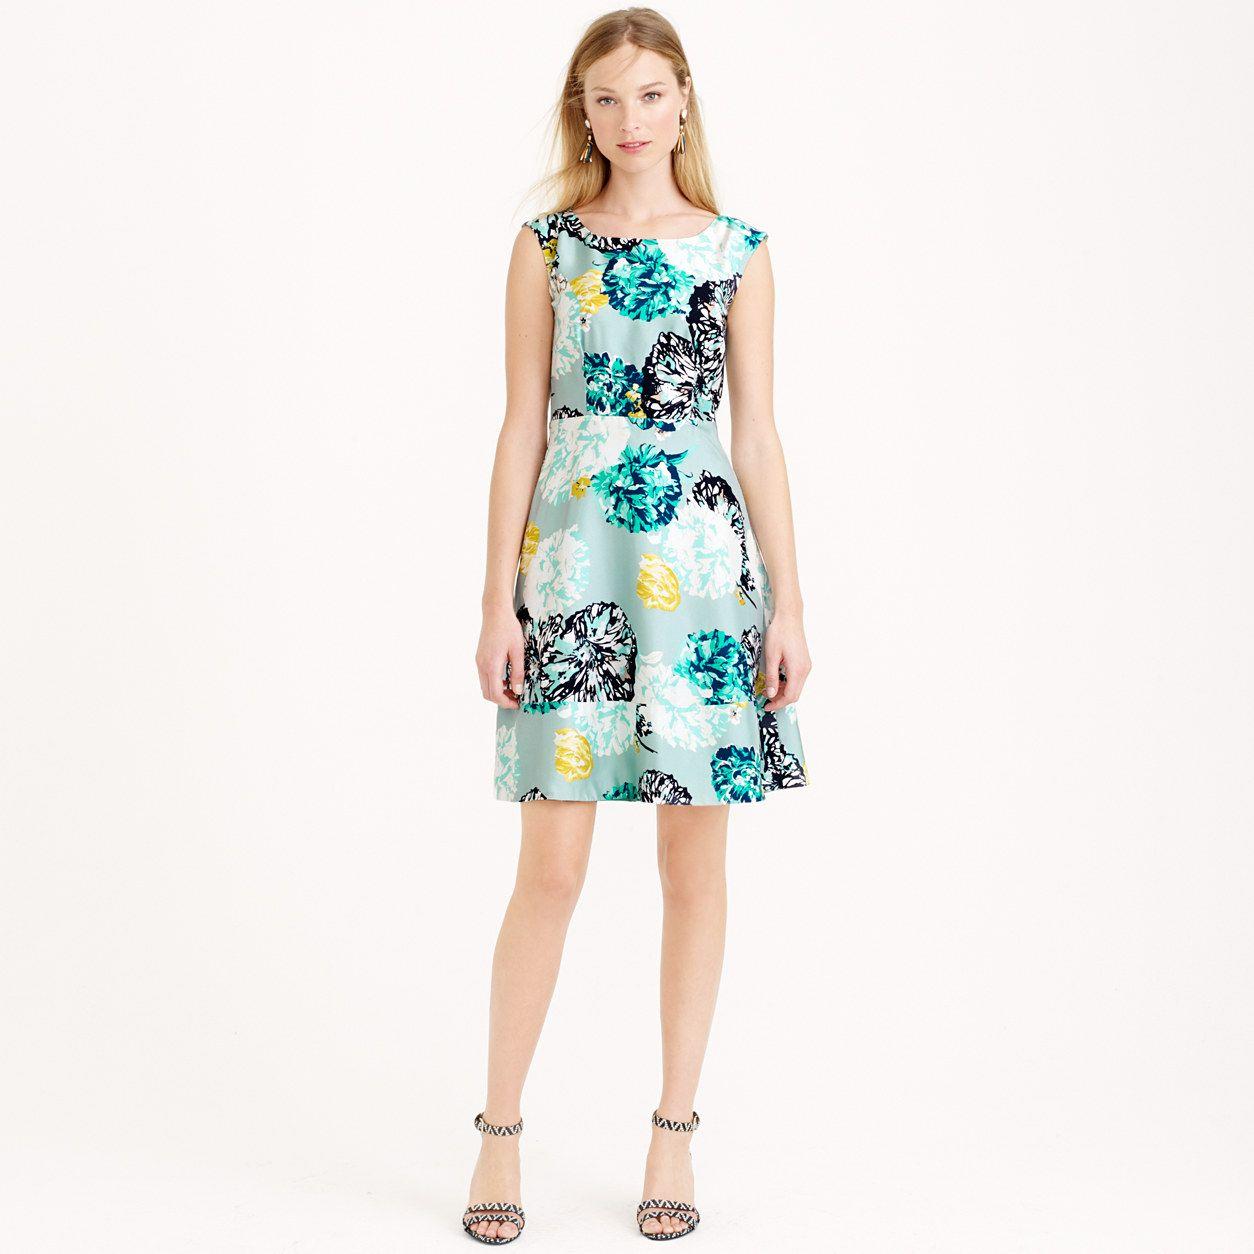 Aquatic floral silk dress day jew sewing inspiration aquatic floral silk dress day jew ombrellifo Choice Image